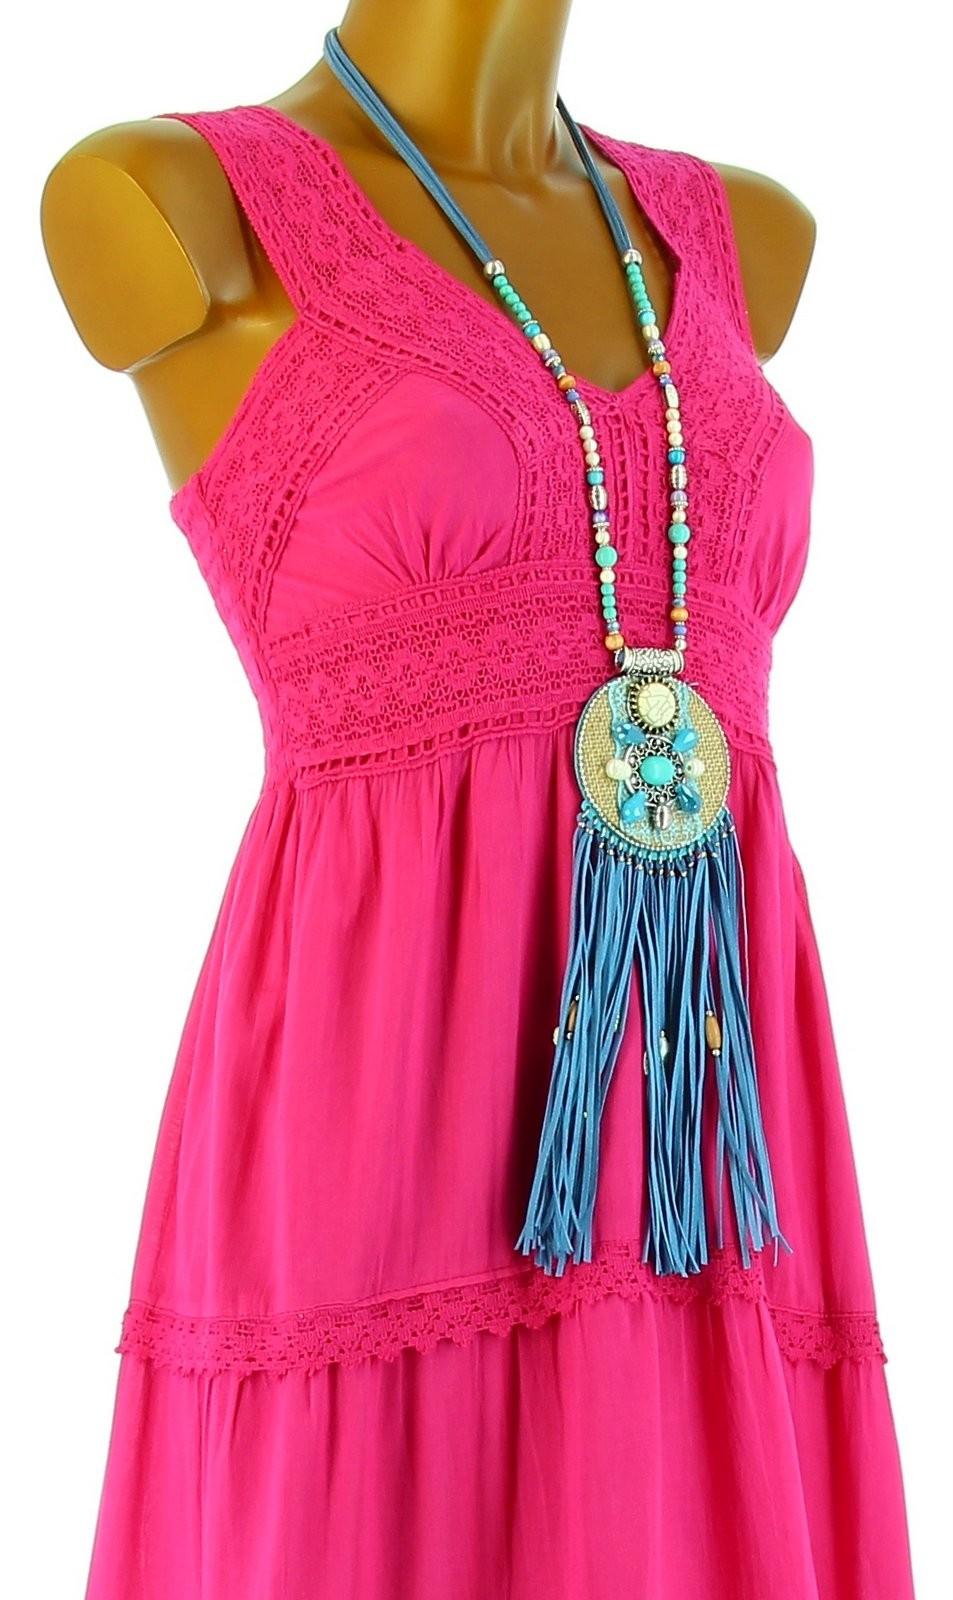 robe longue t dentelle coton boho fushia adriana rose ebay. Black Bedroom Furniture Sets. Home Design Ideas